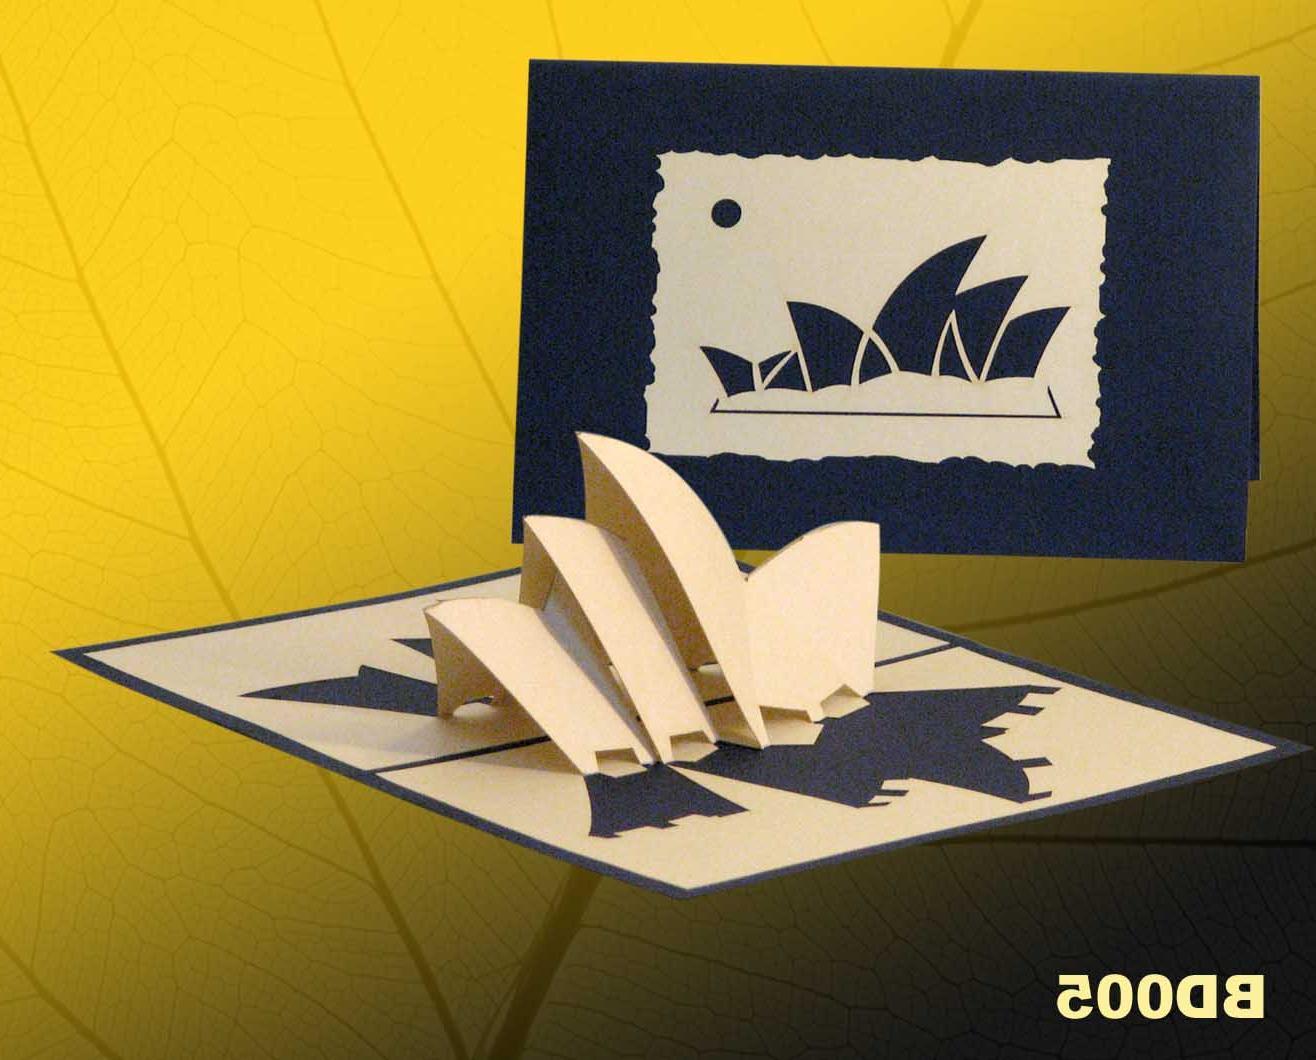 Sydney pop up greeting card